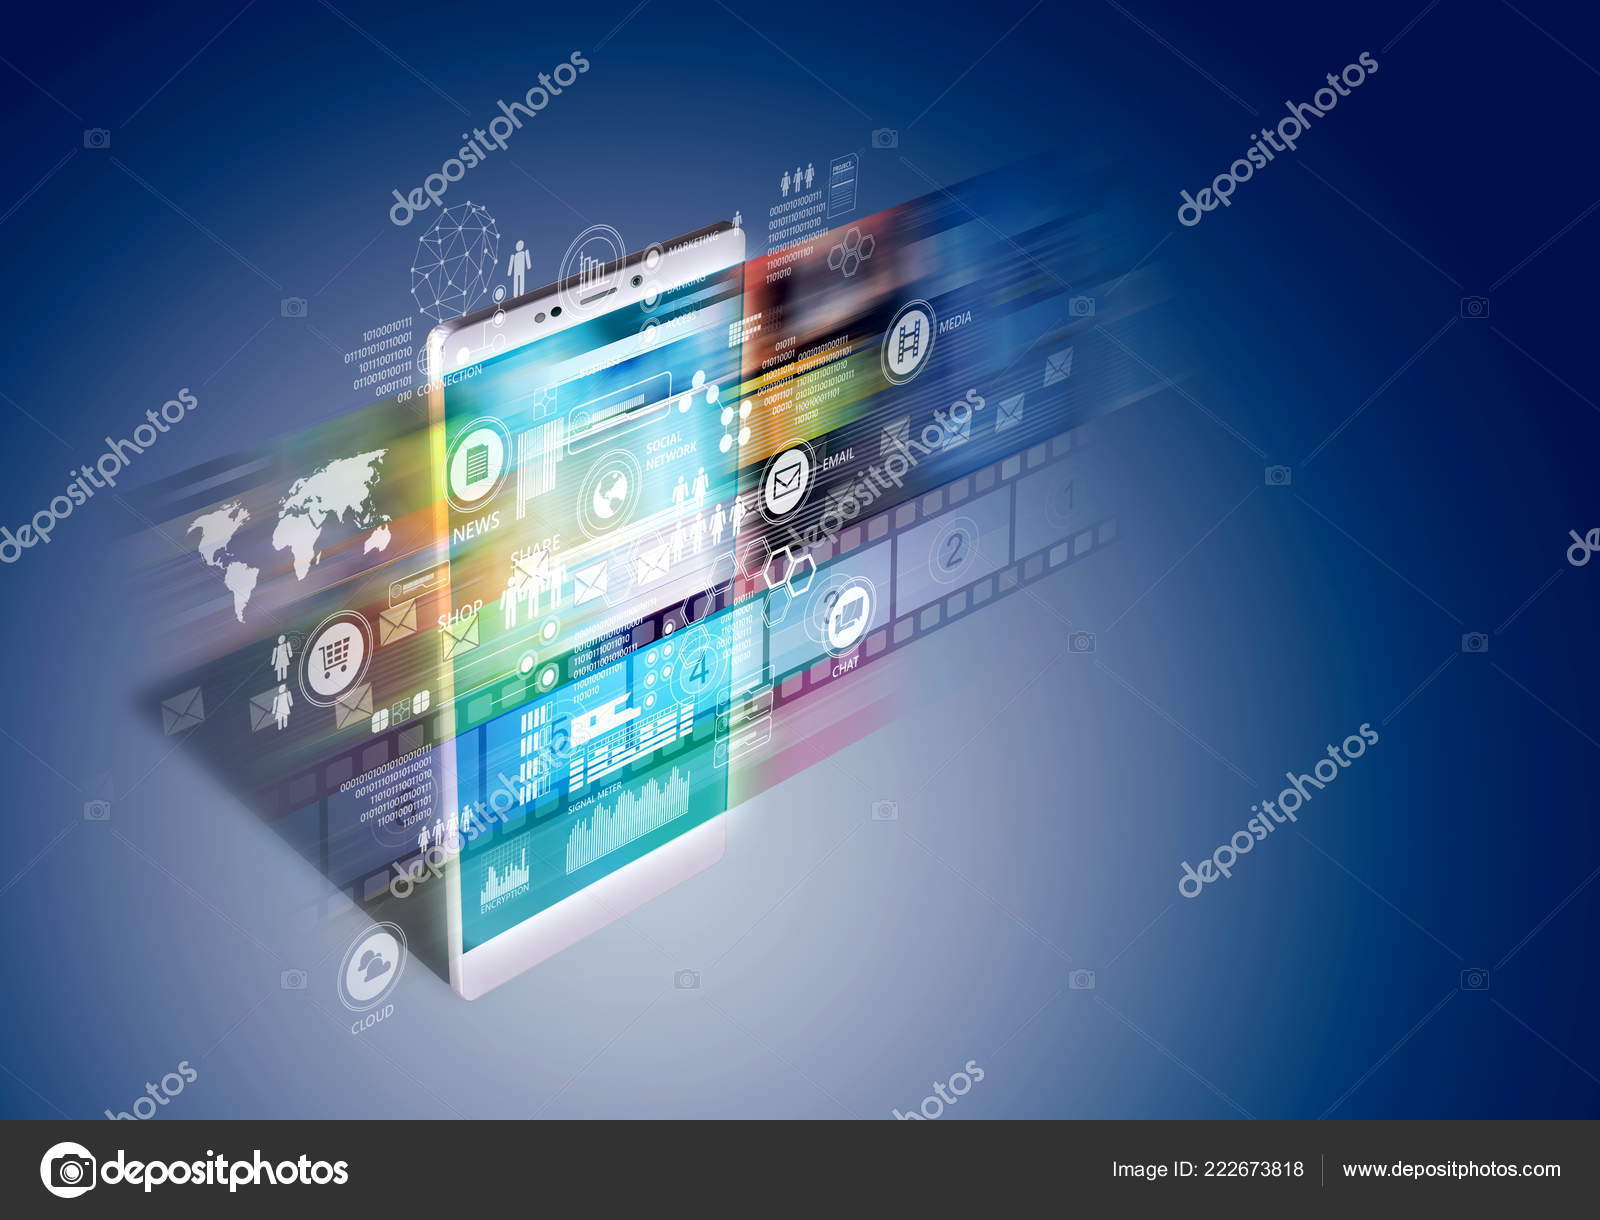 Internet Broadband Concept Smart Phone Showing Application